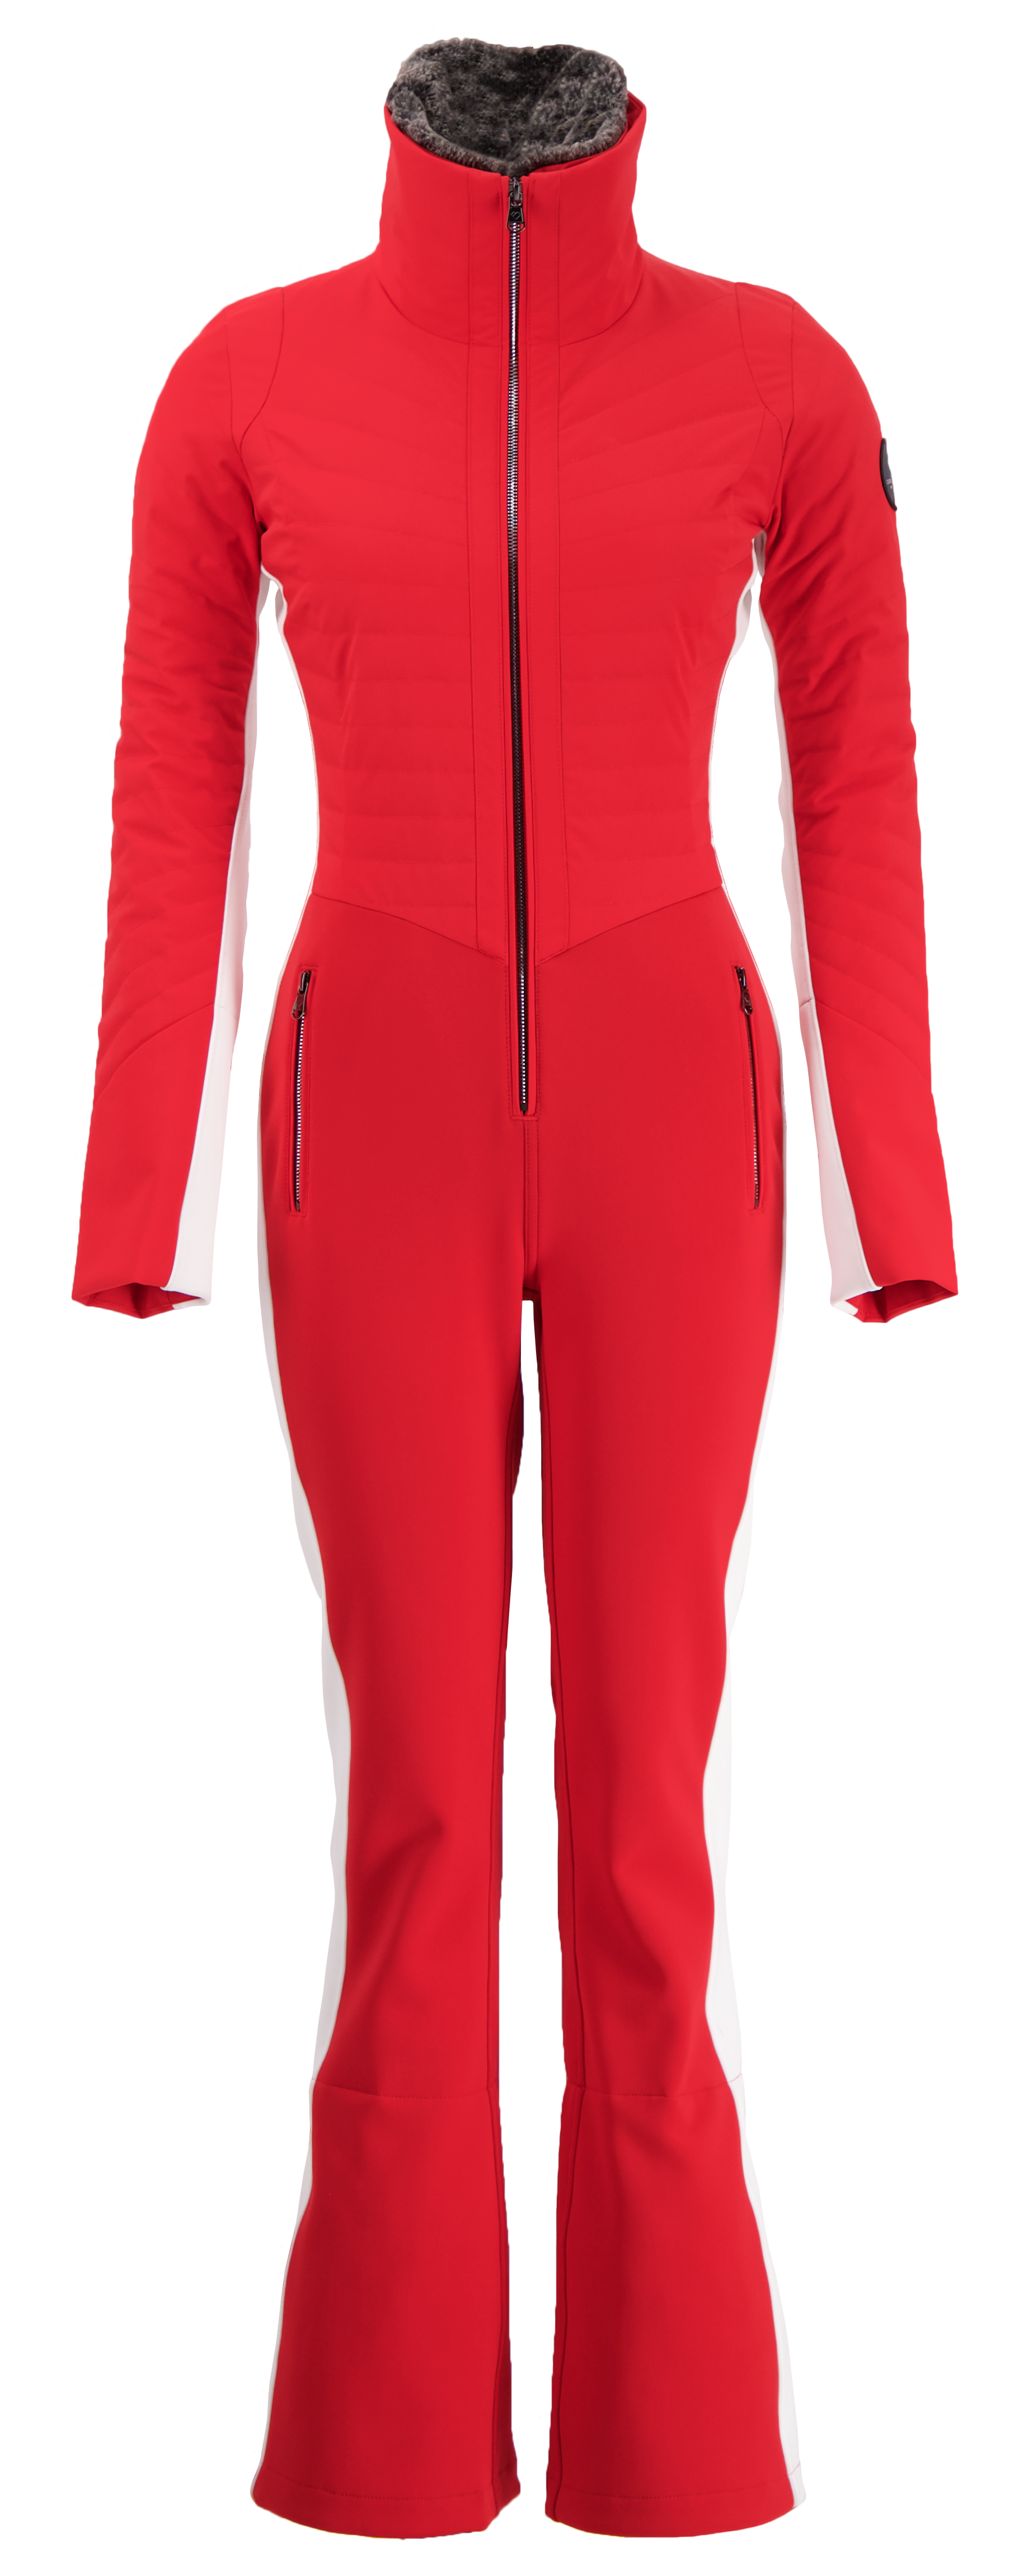 2016 Ski Tester Bios tout